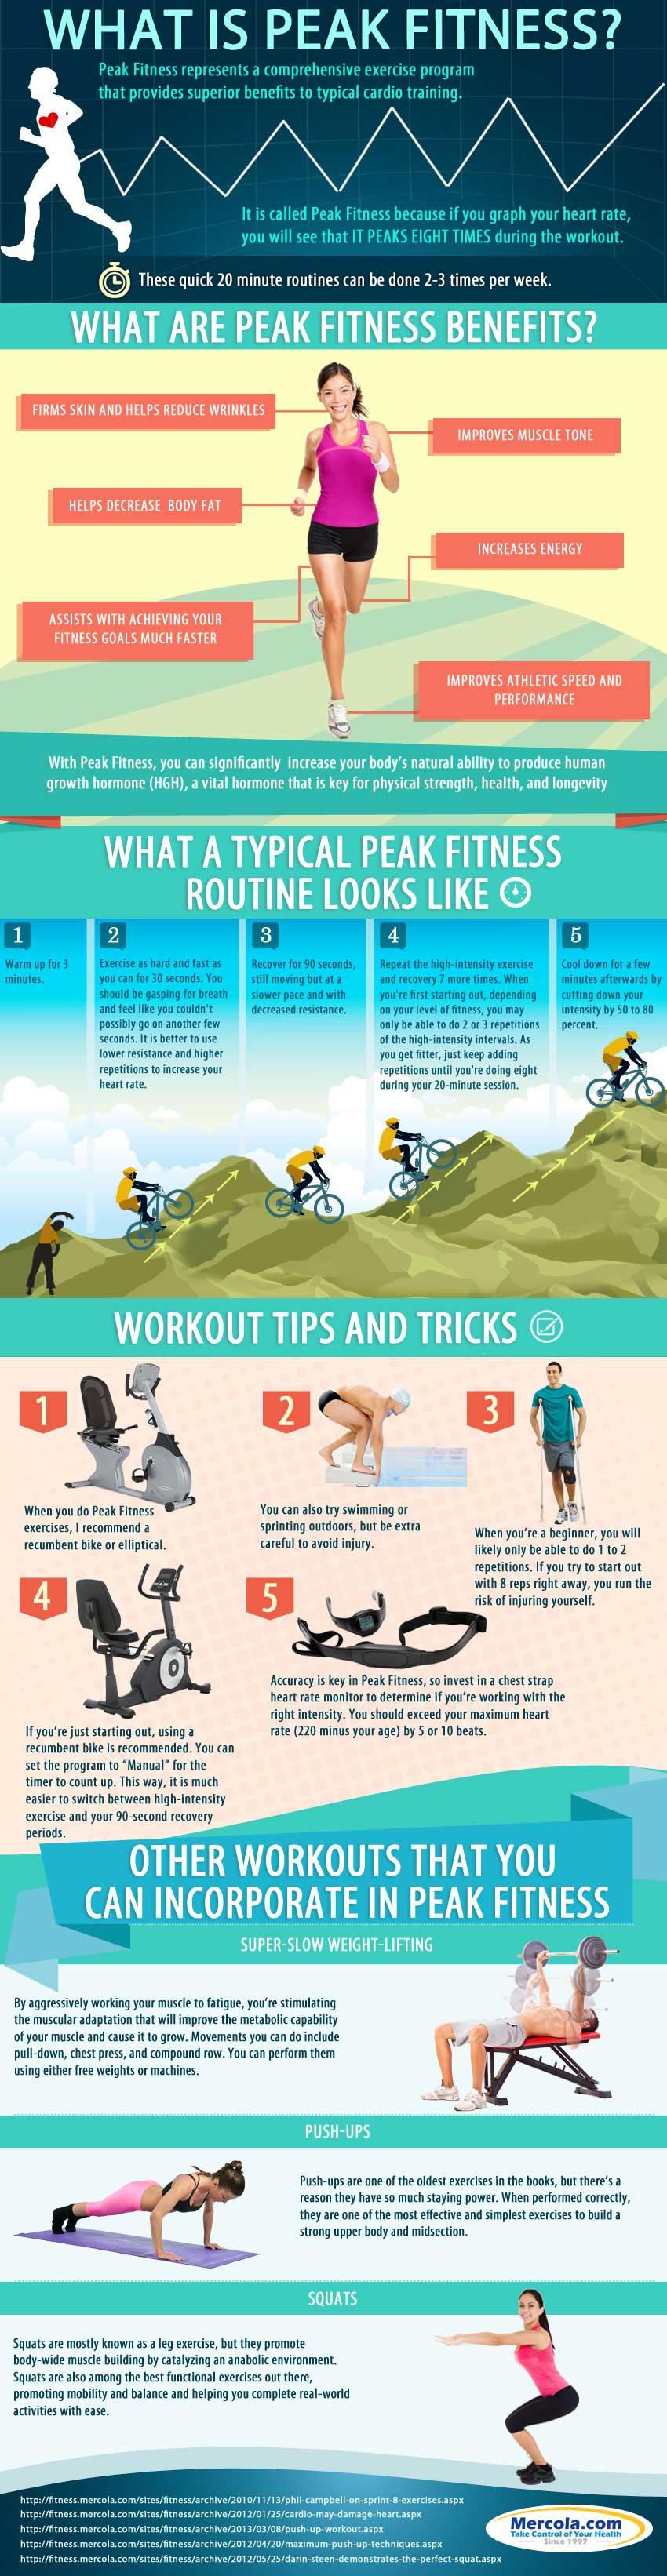 Peak fitness routine